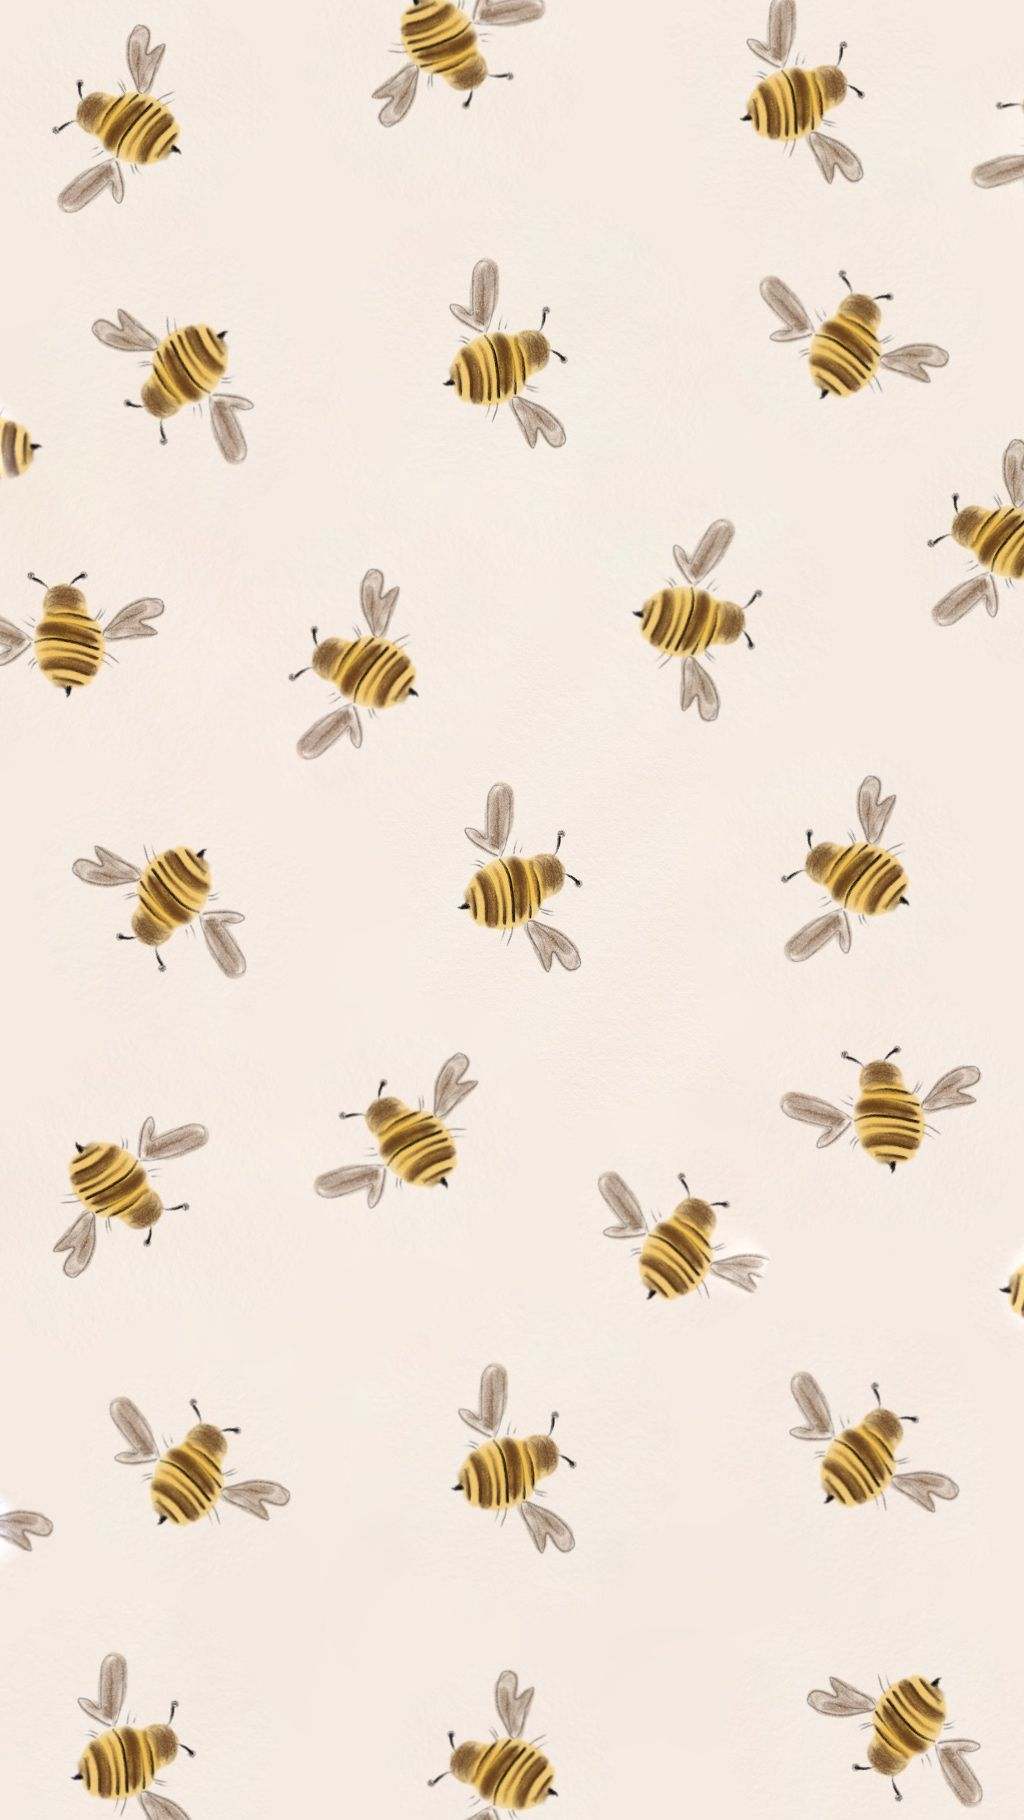 Bee Wallpaper Pastel Iphone Wallpaper Cute Patterns Wallpaper Iphone Wallpaper Tumblr Aesthetic